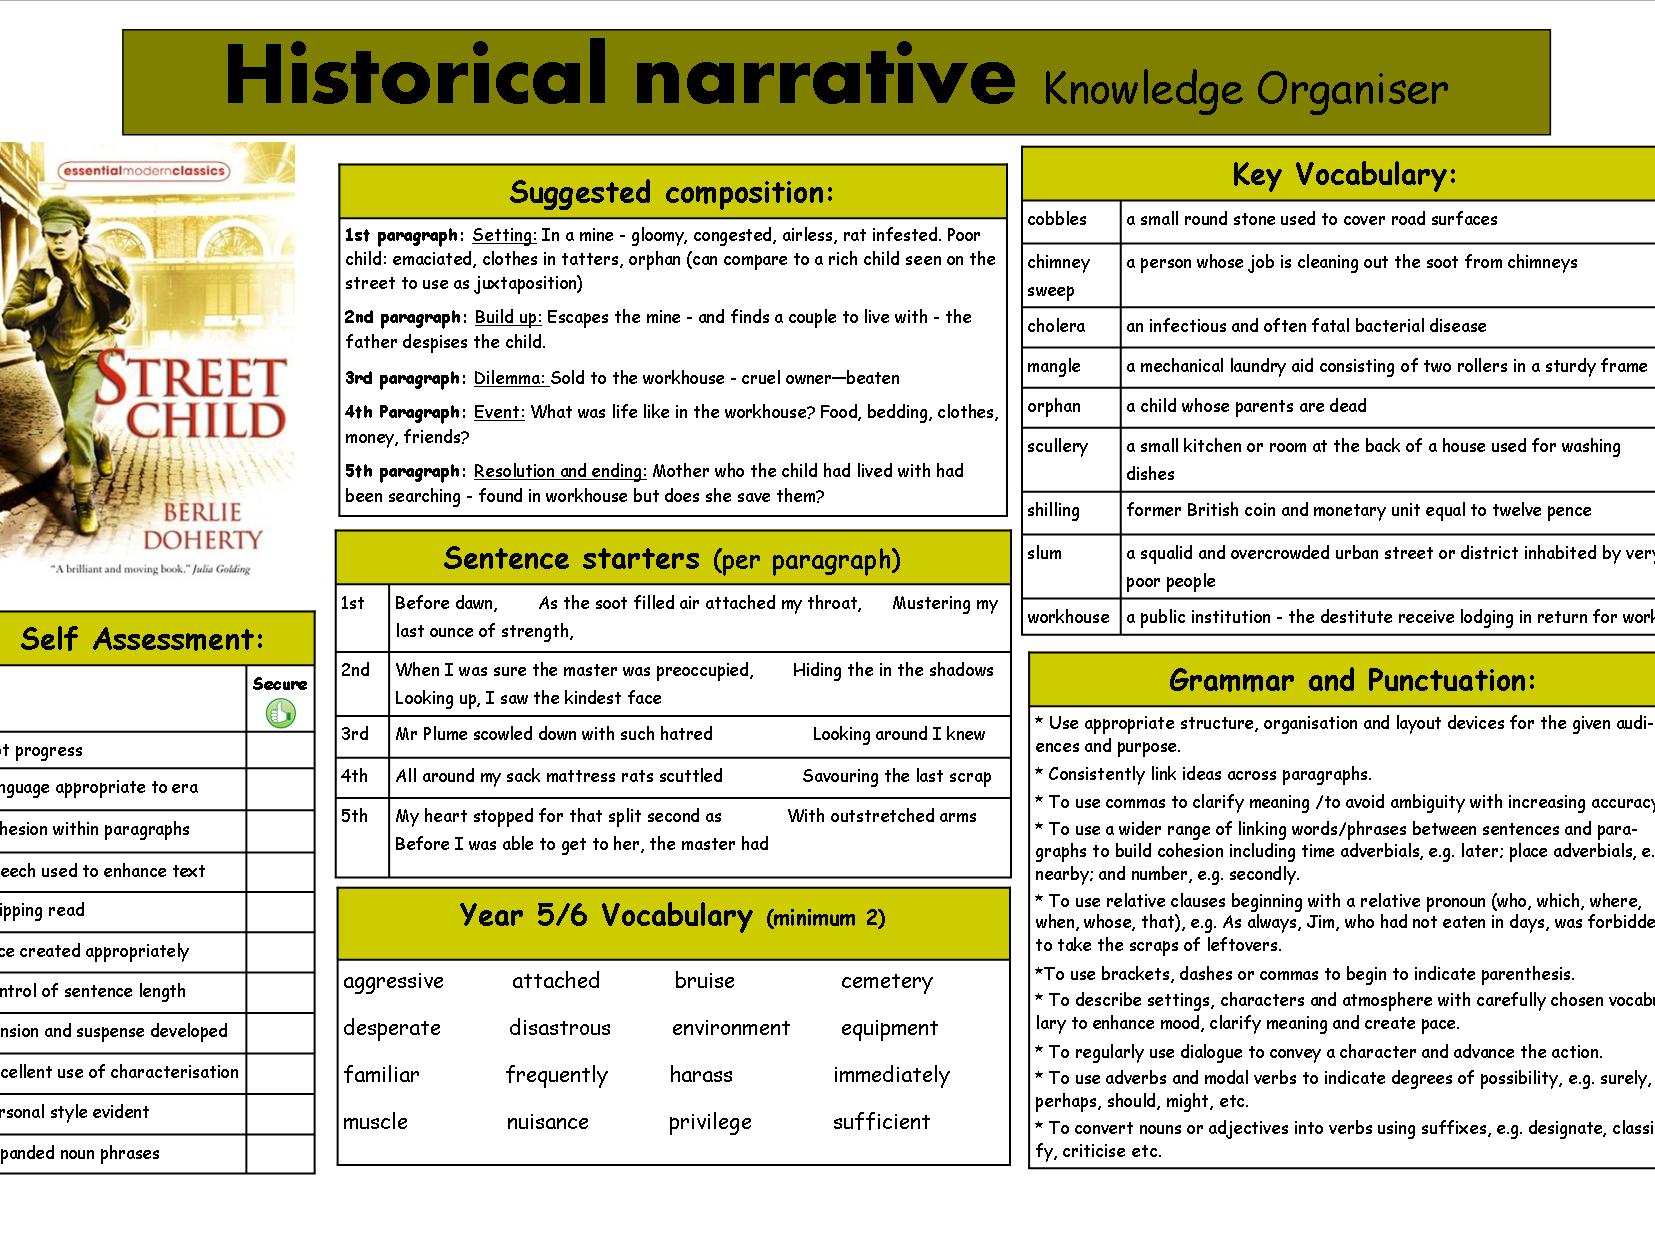 Historical Narrative Knowledge Organiser based on Street Child